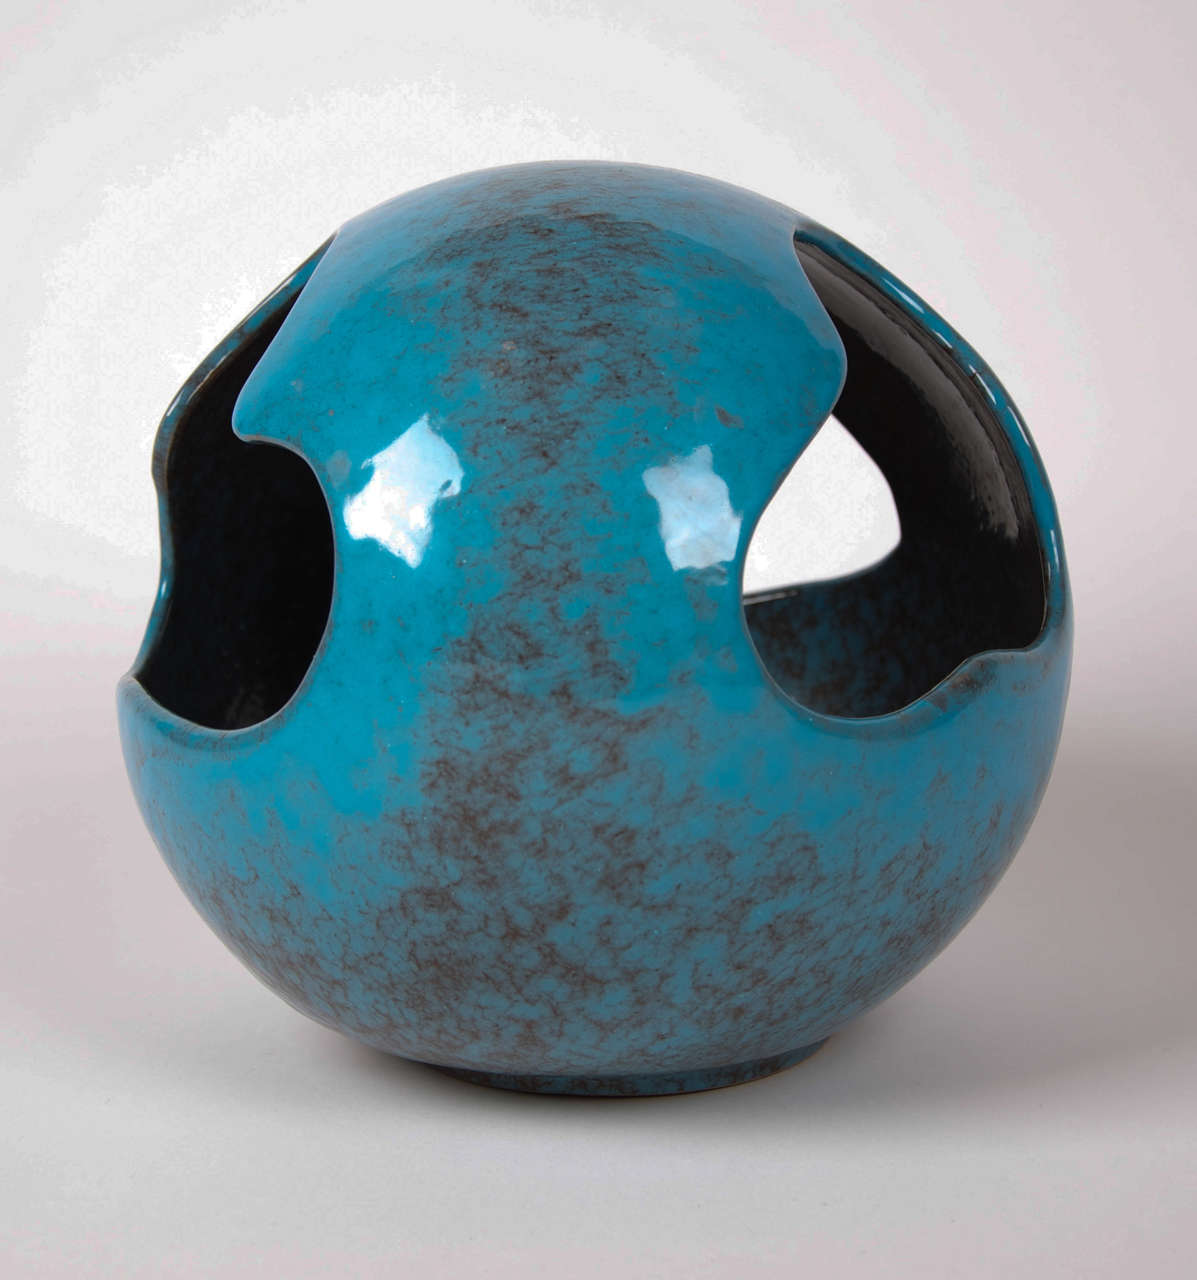 1950 Italian pottery sculpture by Antonia Campi 2